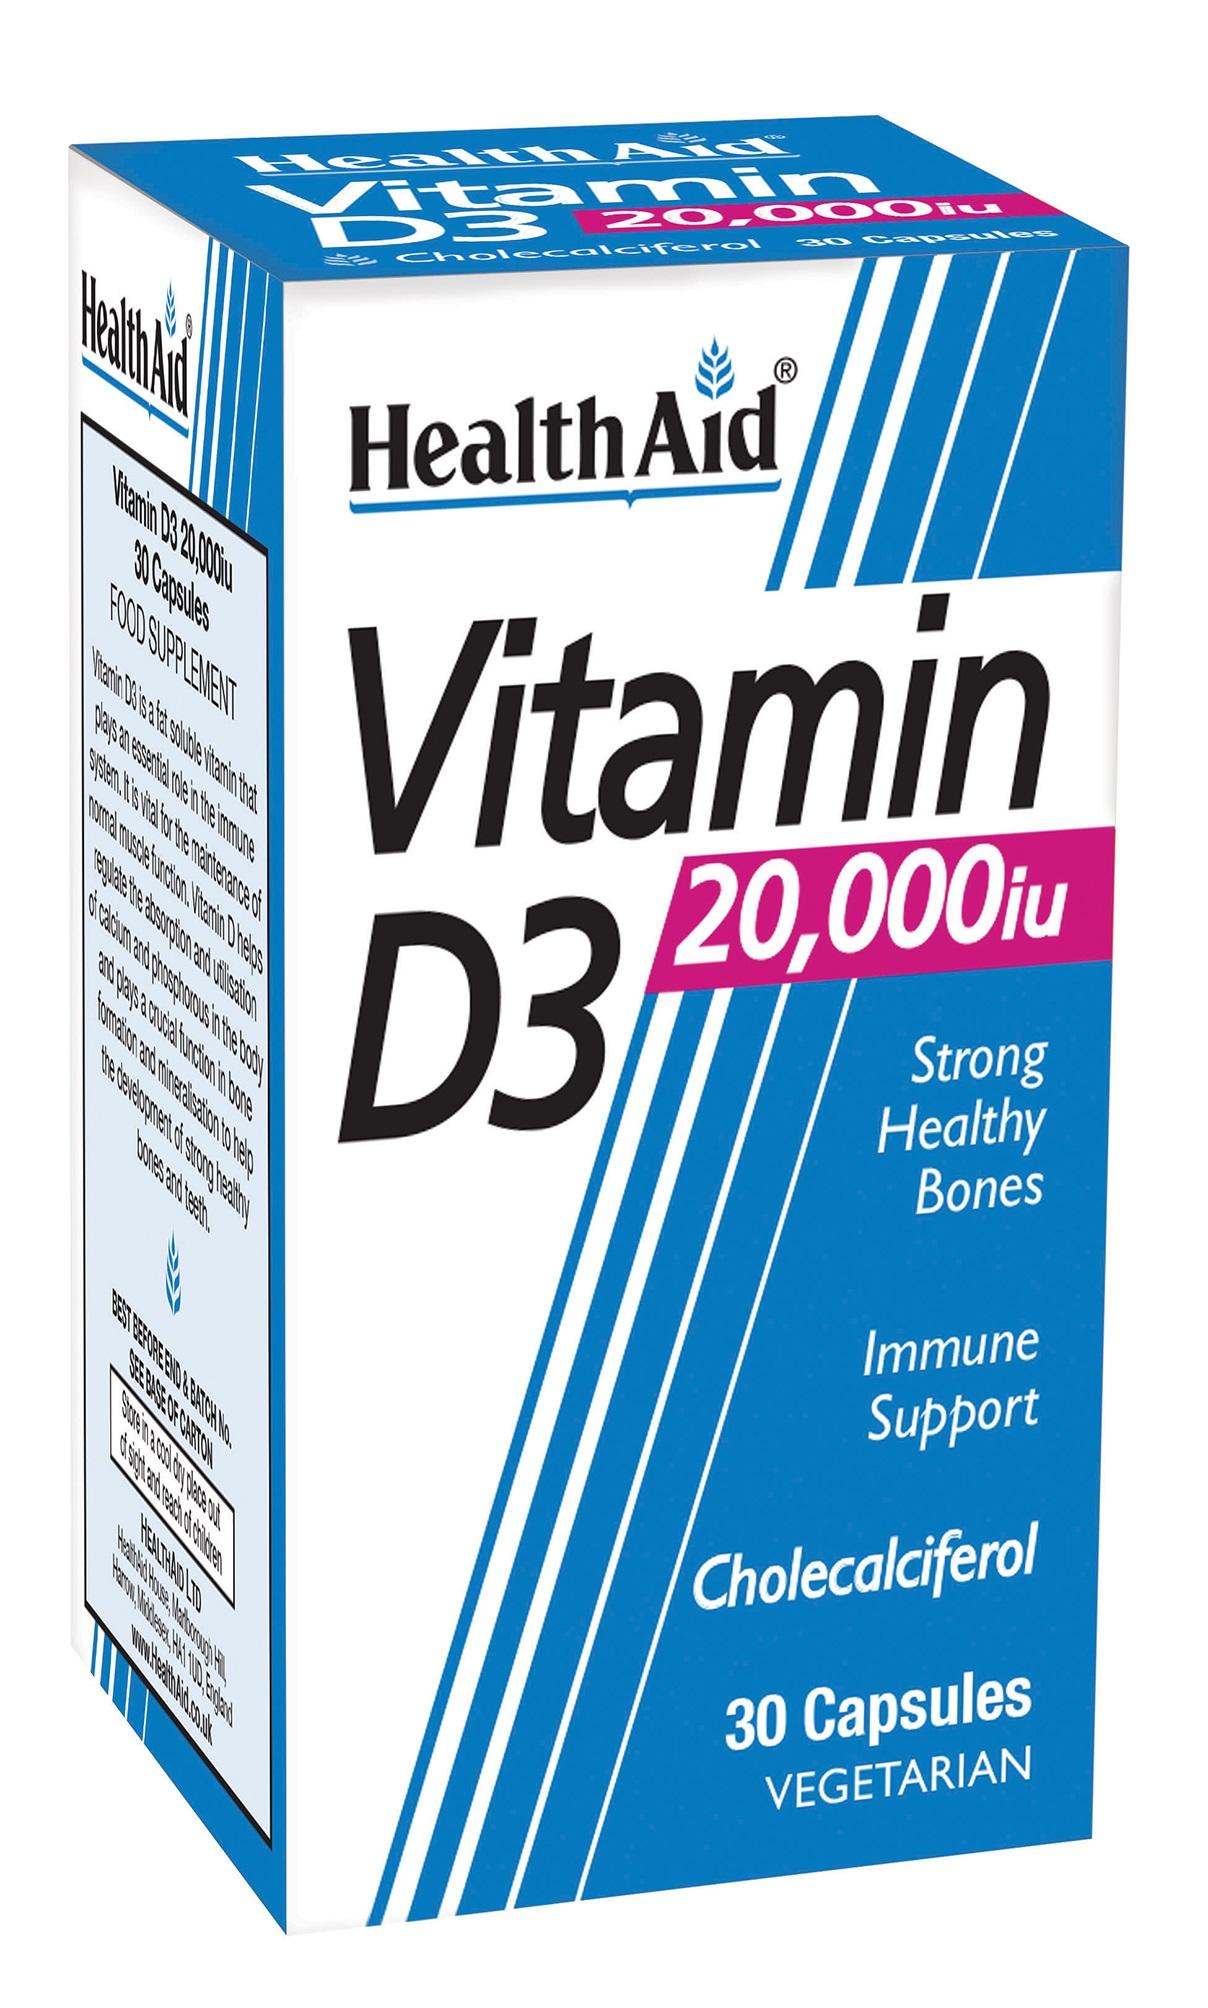 Vitamin D3 20,000iu 30's